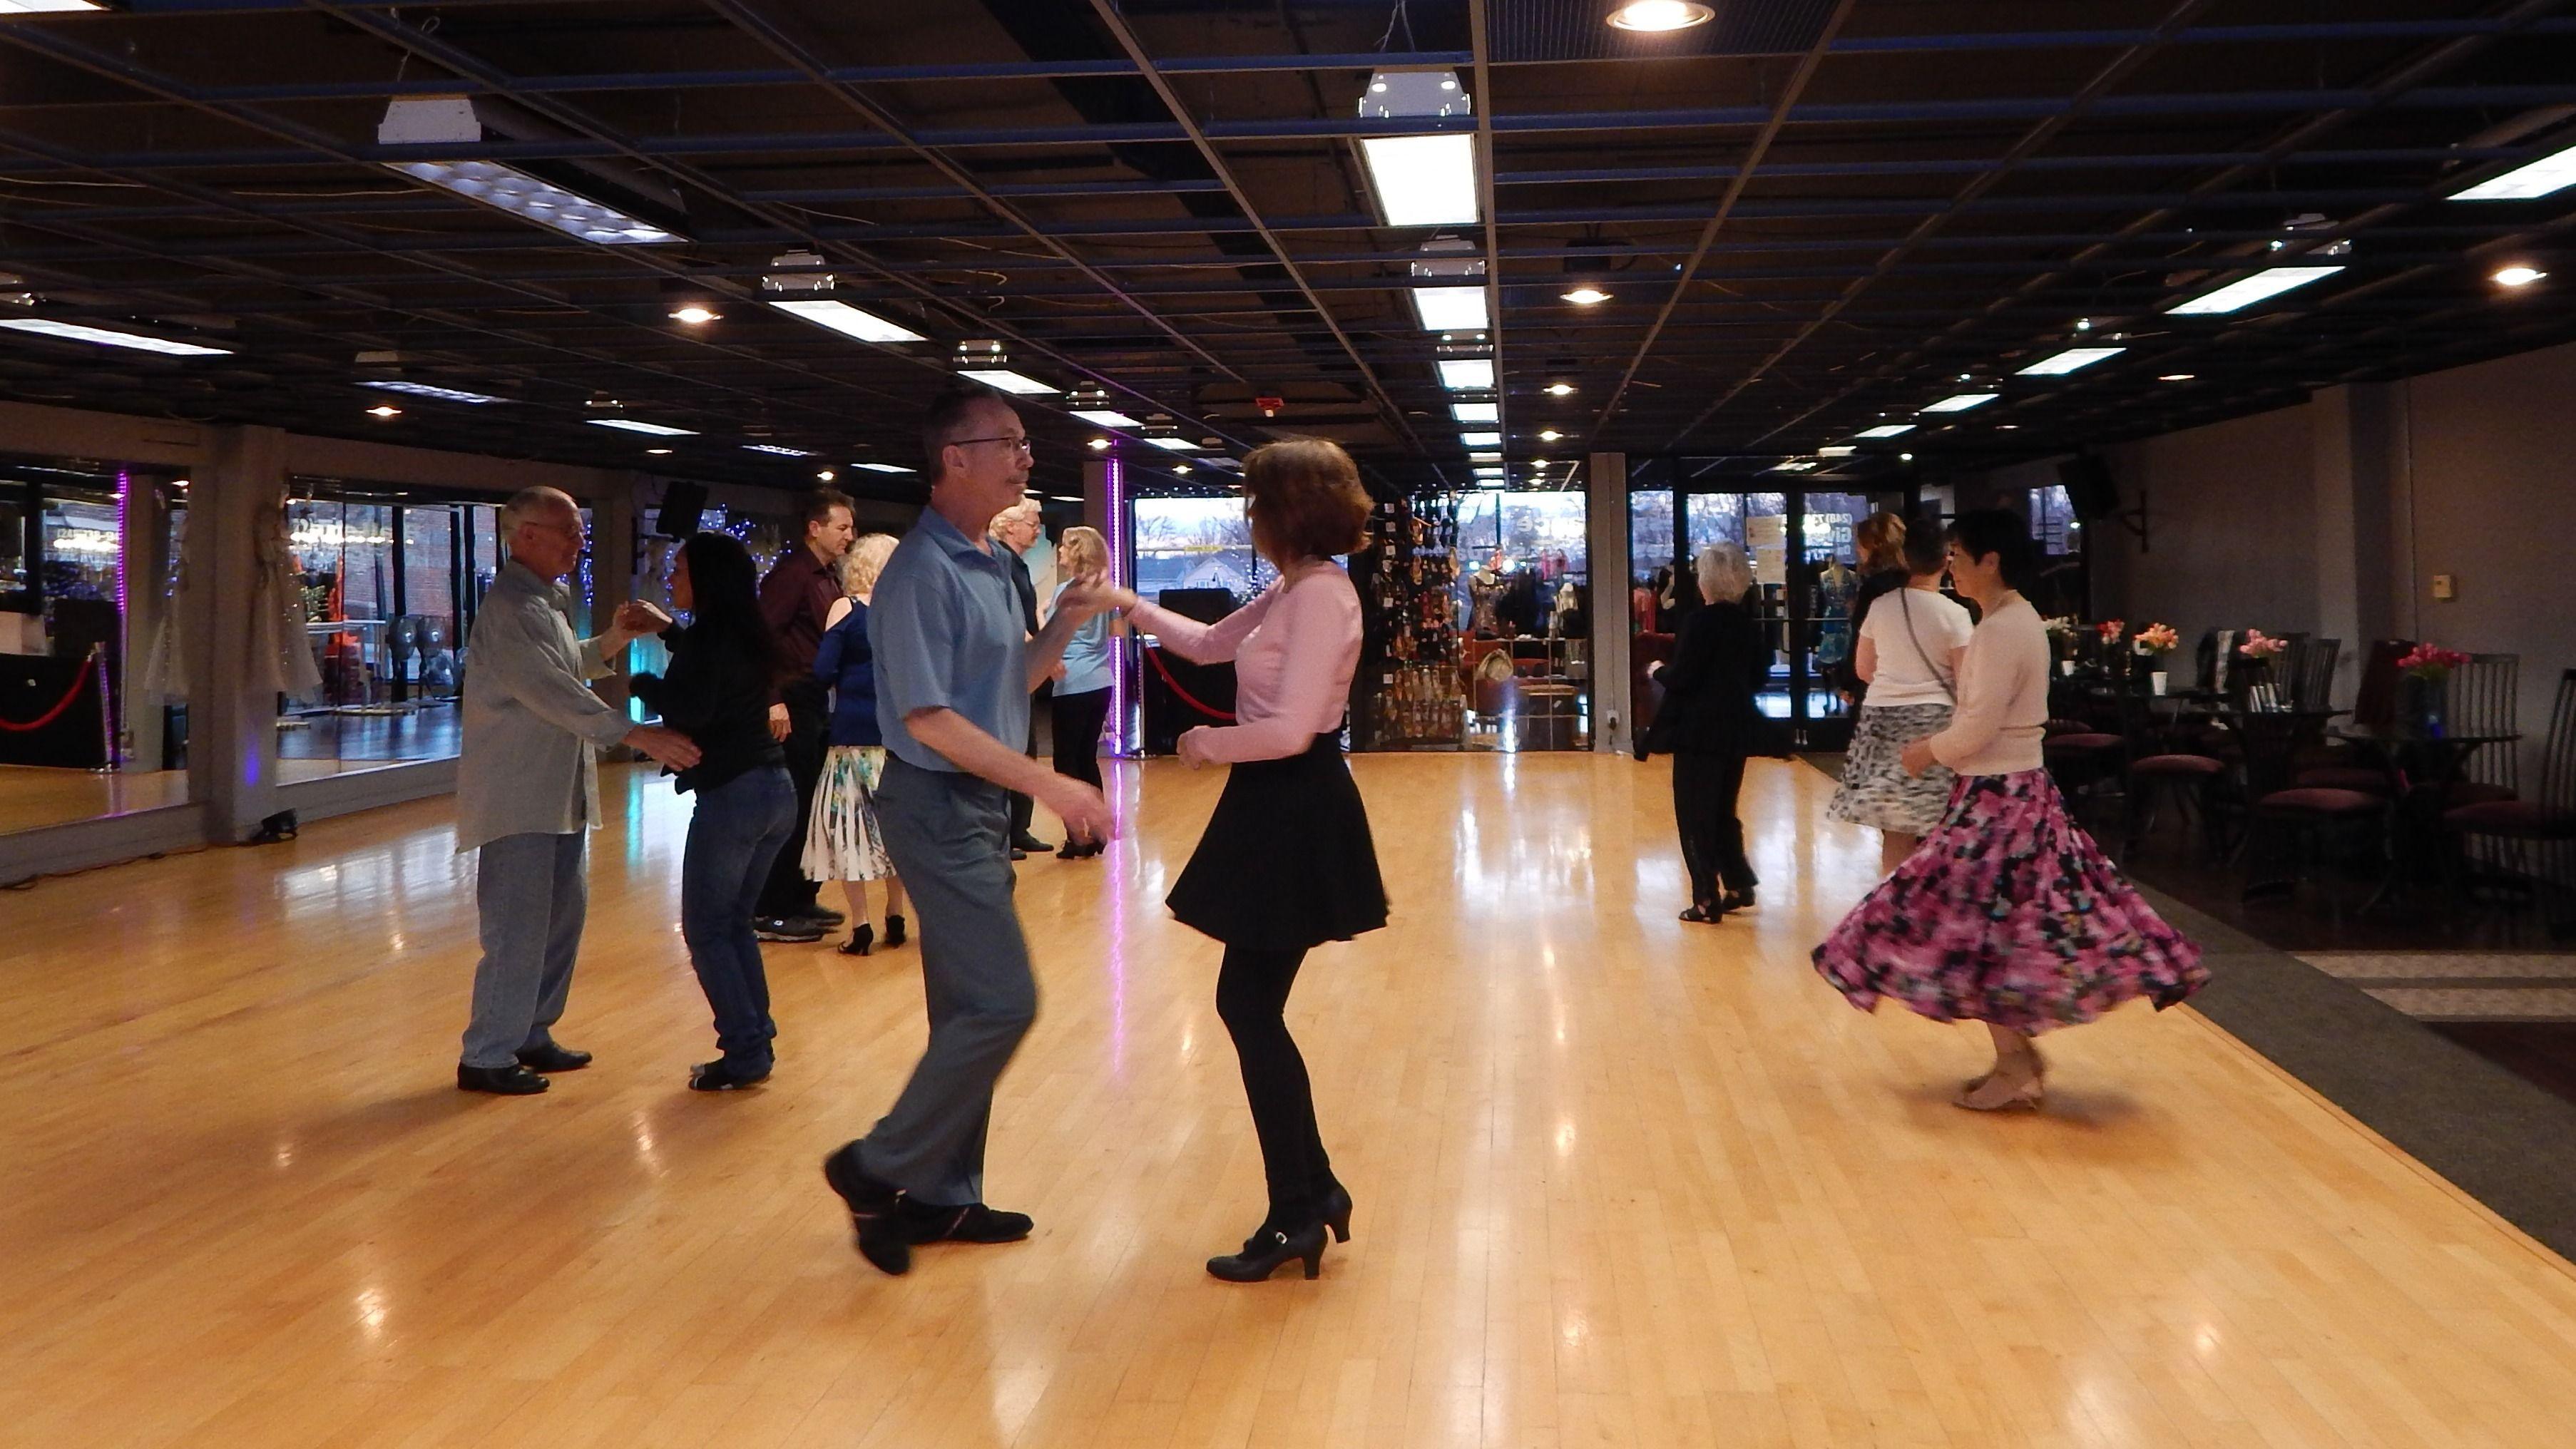 Dancing at Loretta's Boutique & Ballroom